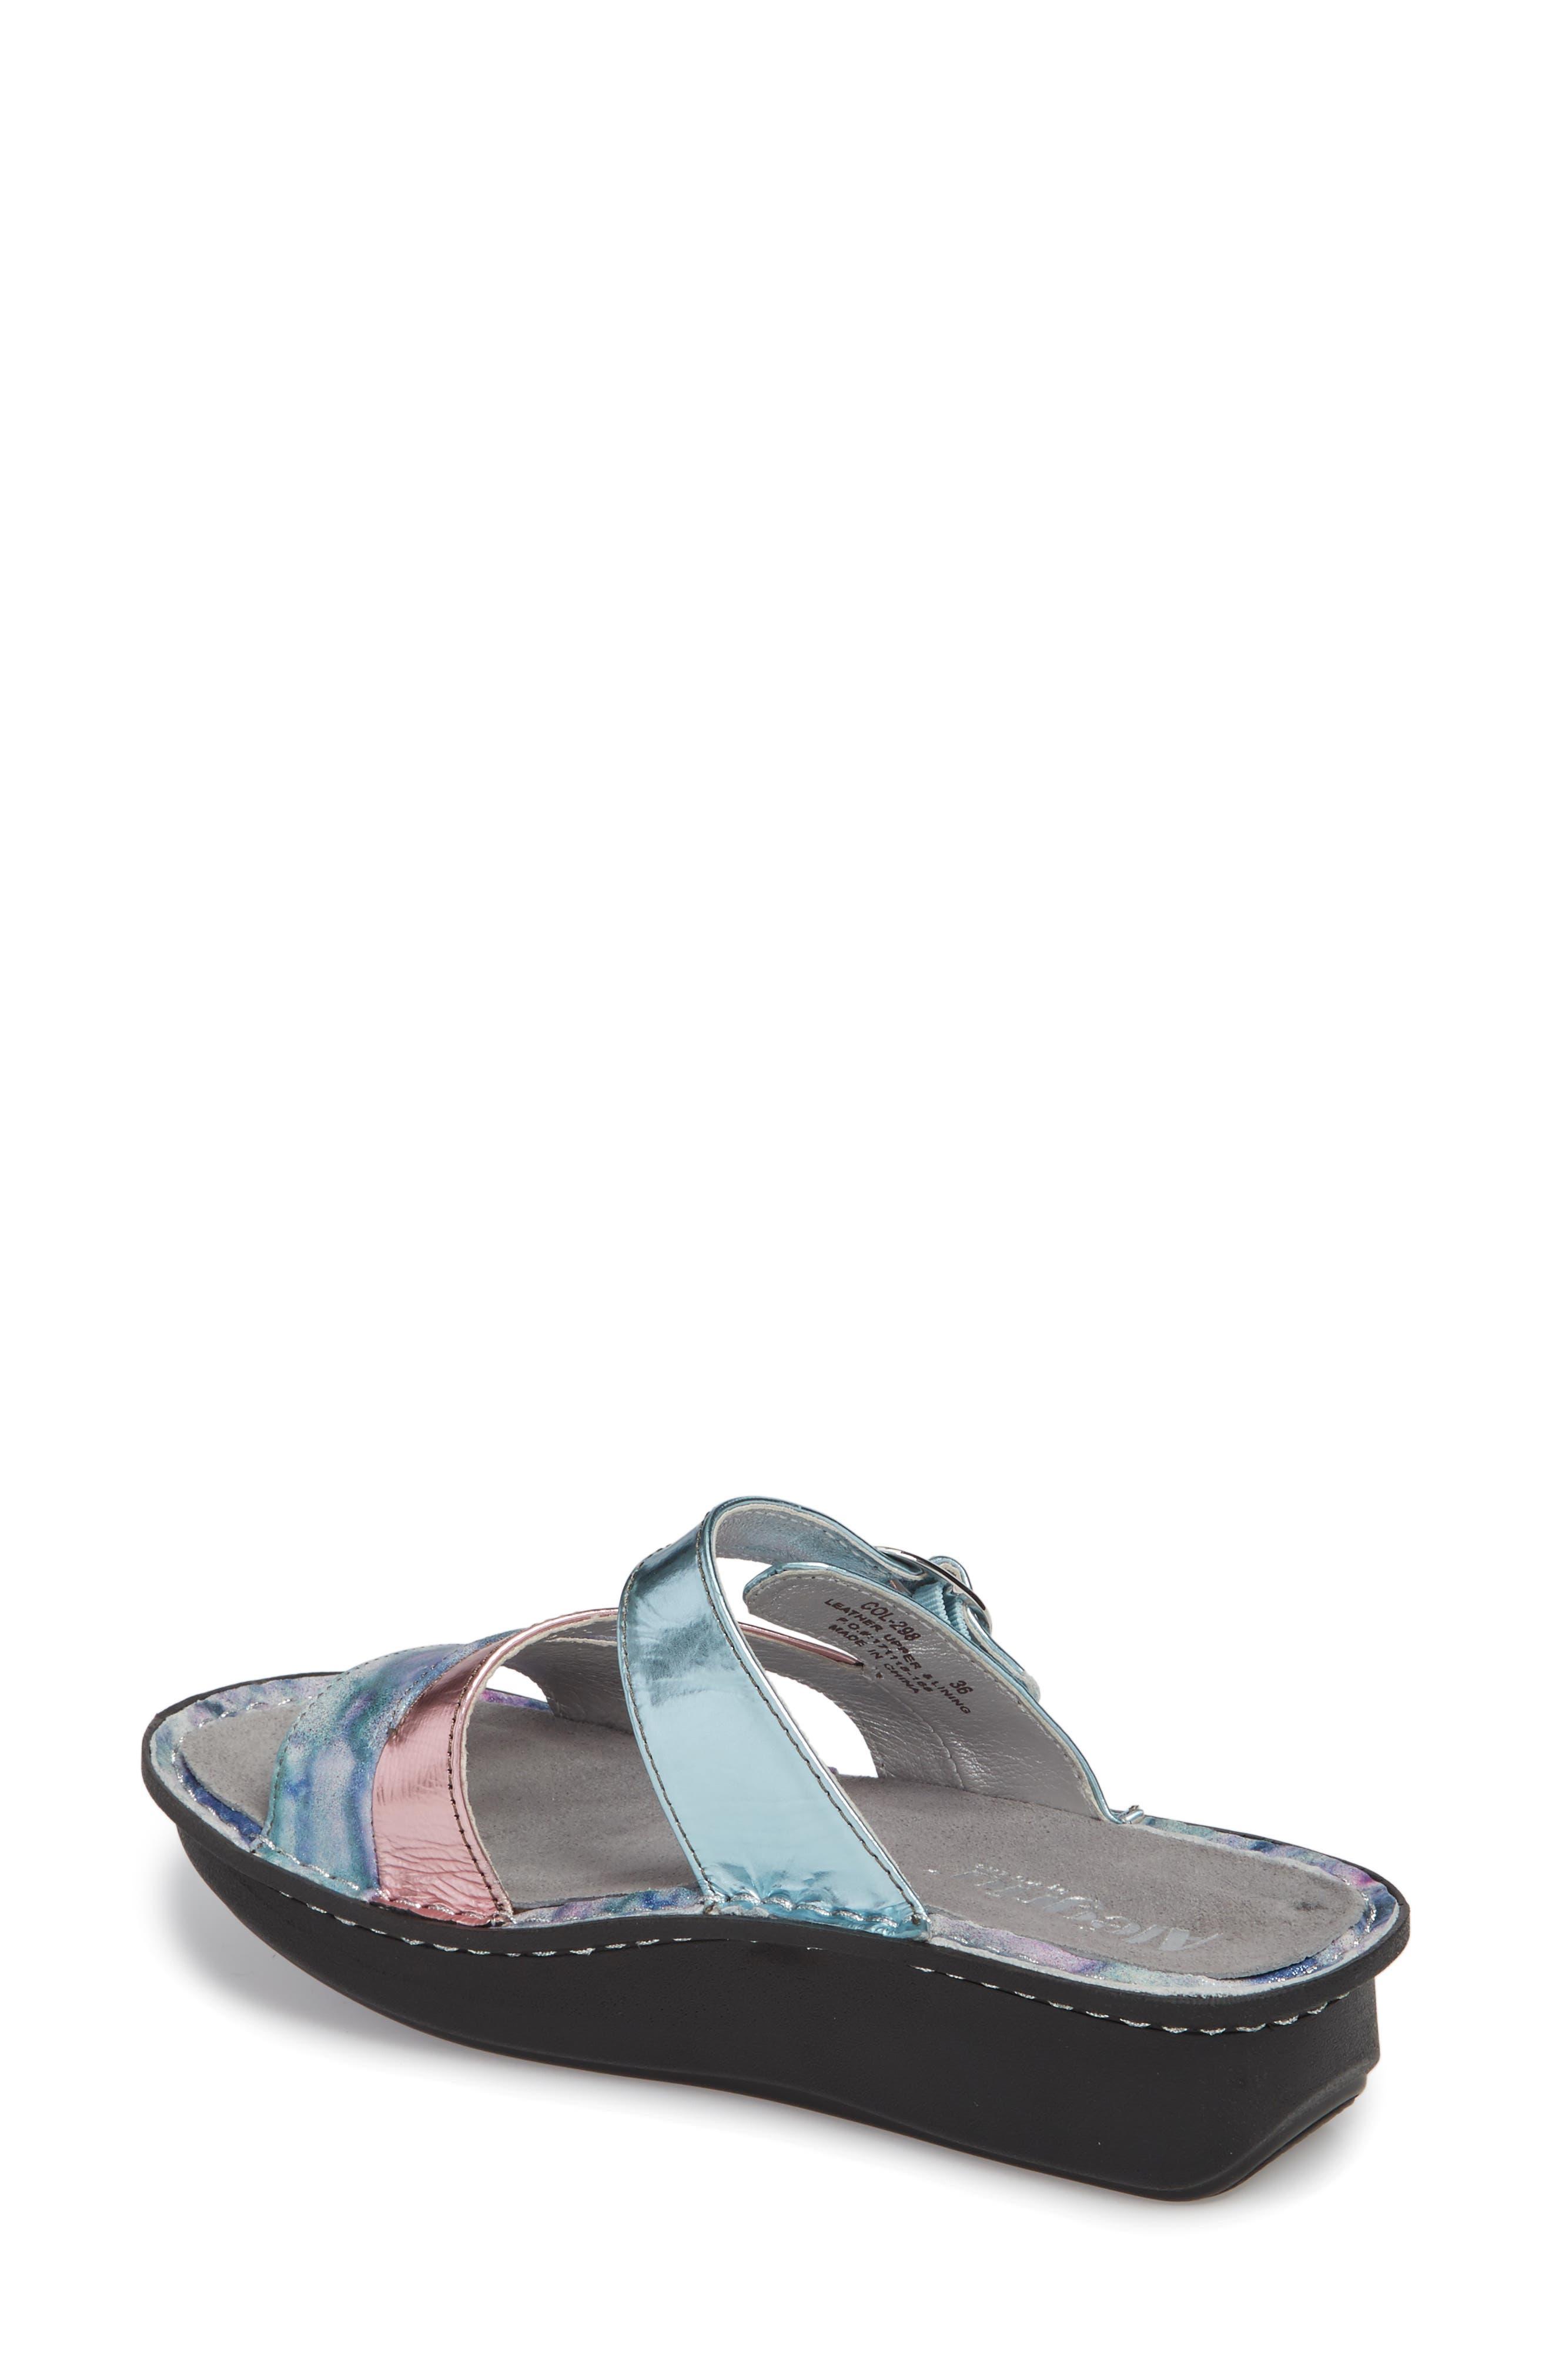 'Colette' Platform Sandal,                             Alternate thumbnail 18, color,